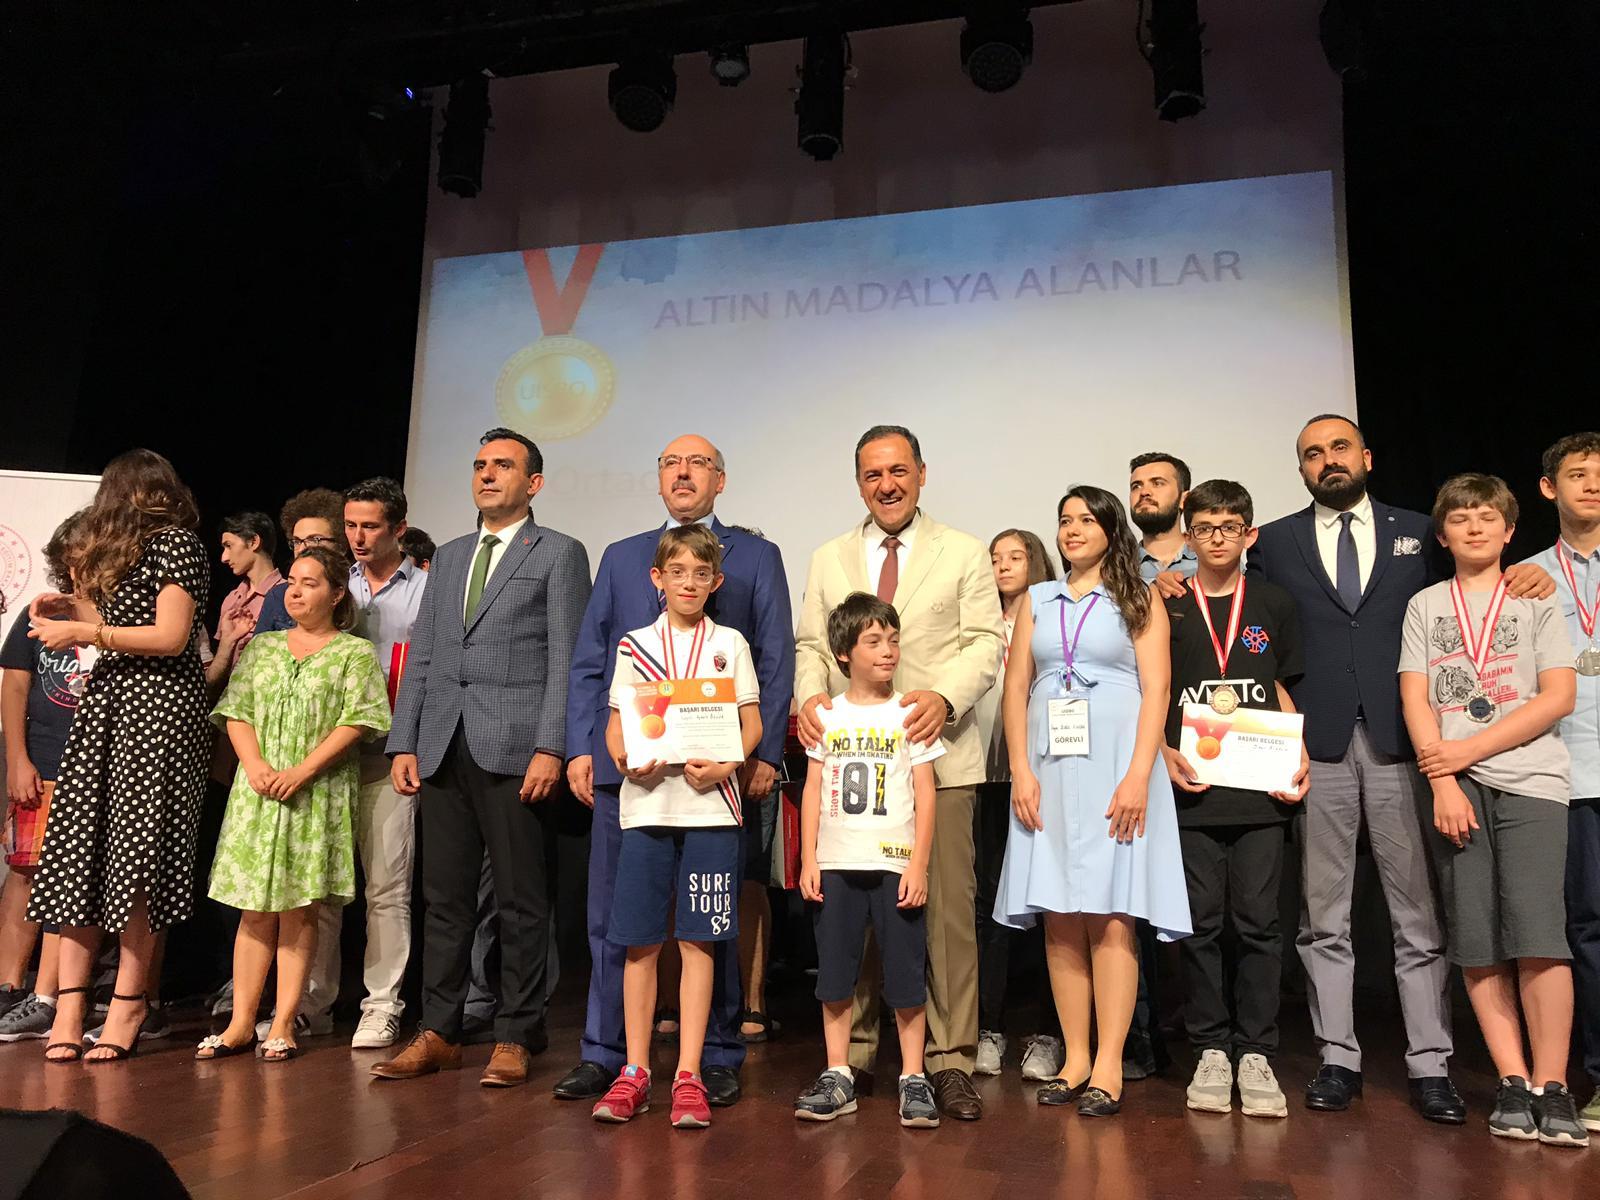 Ulusal İstanbul Bilim Olimpiyatları Sınavında Bronz Madalya